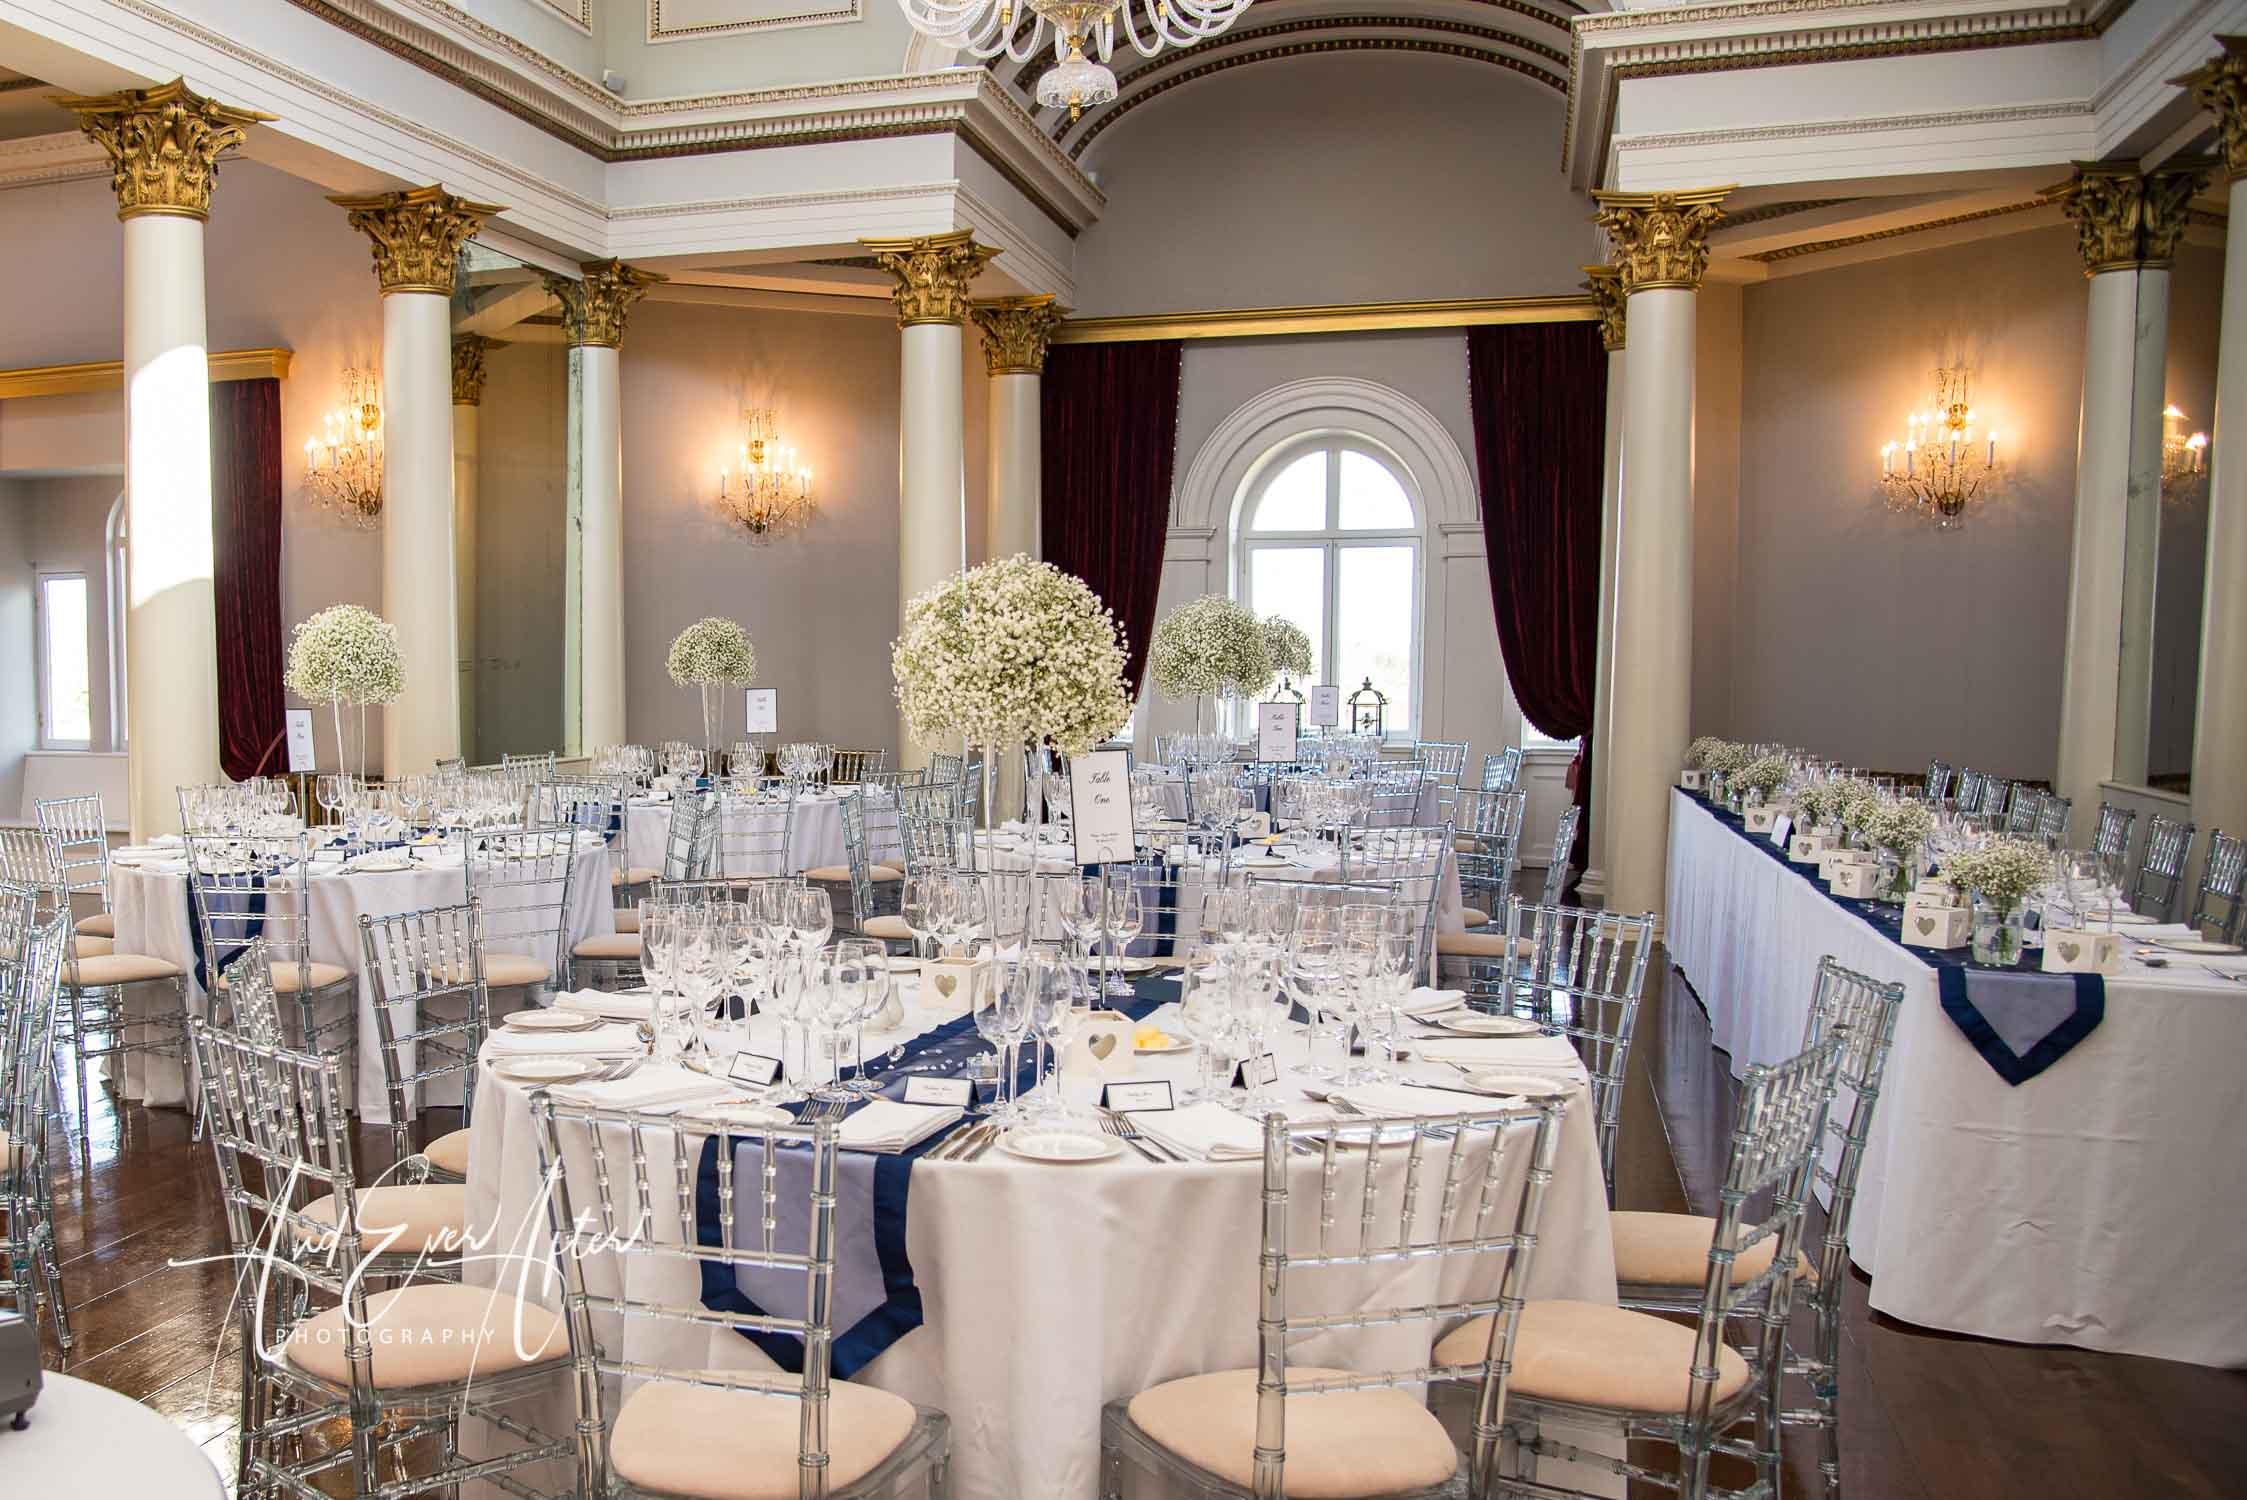 lartington hall wedding venue, wedding breakfast